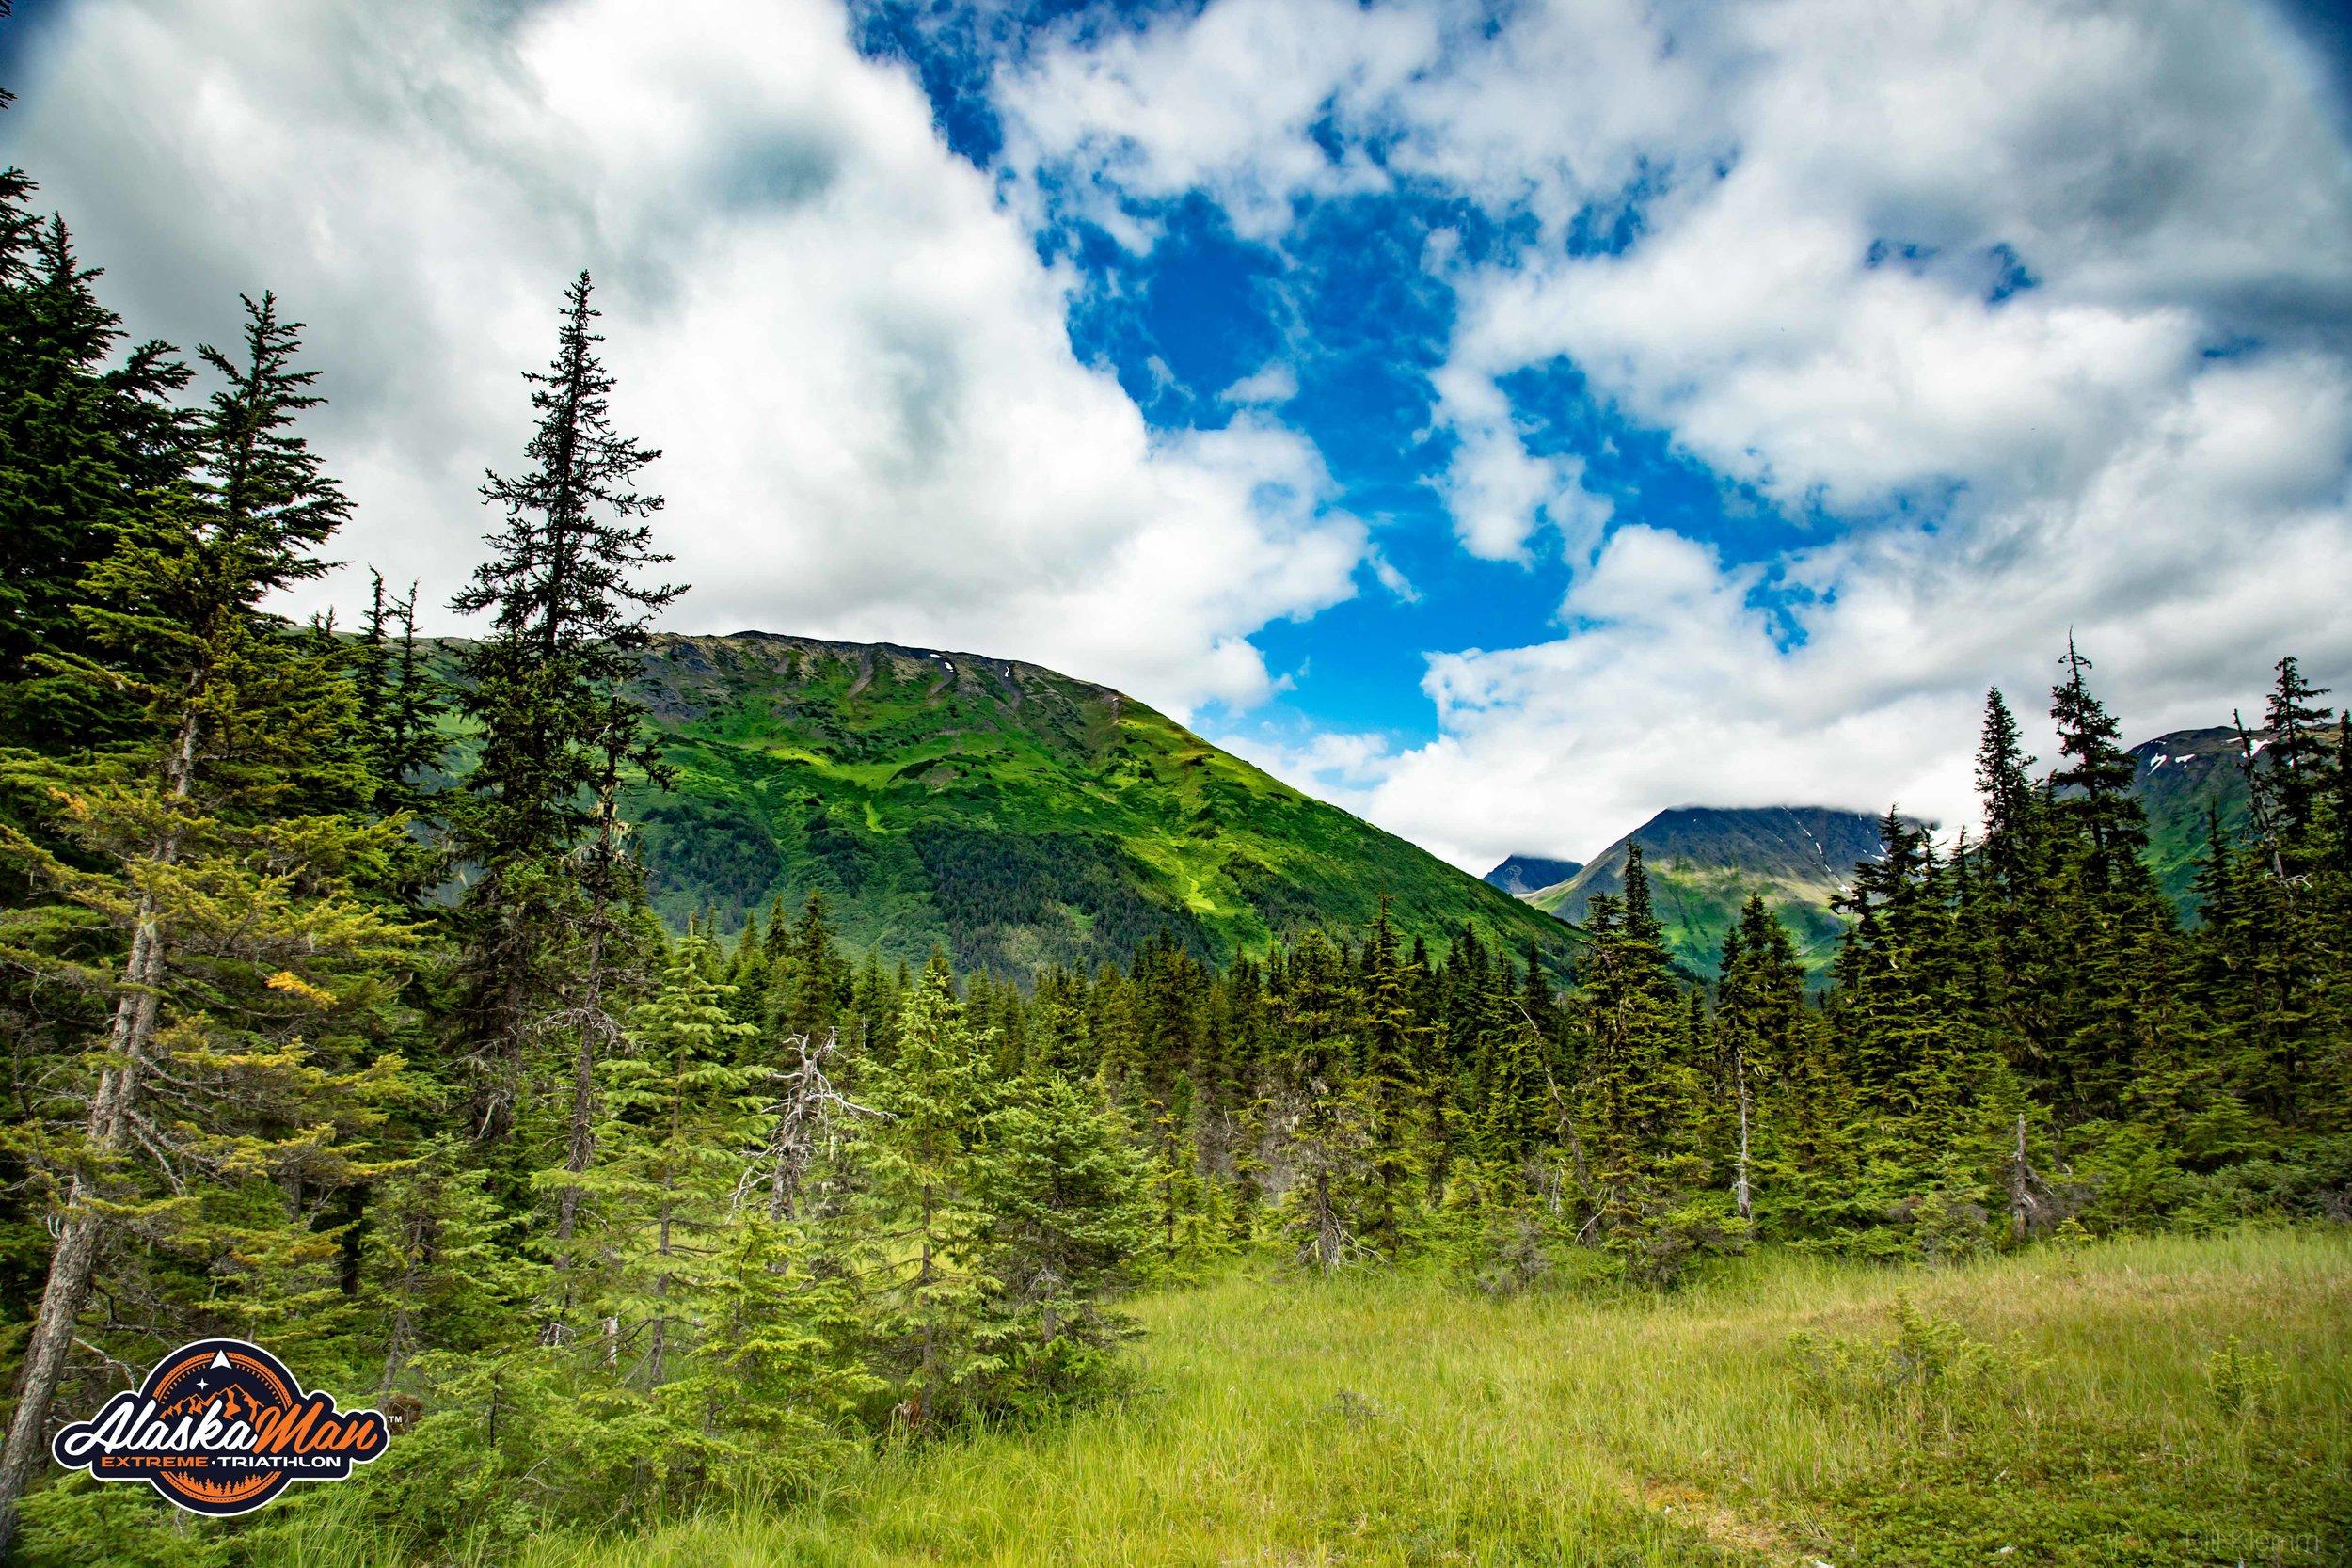 Alaskaman_2017_BK_A2_254.jpg